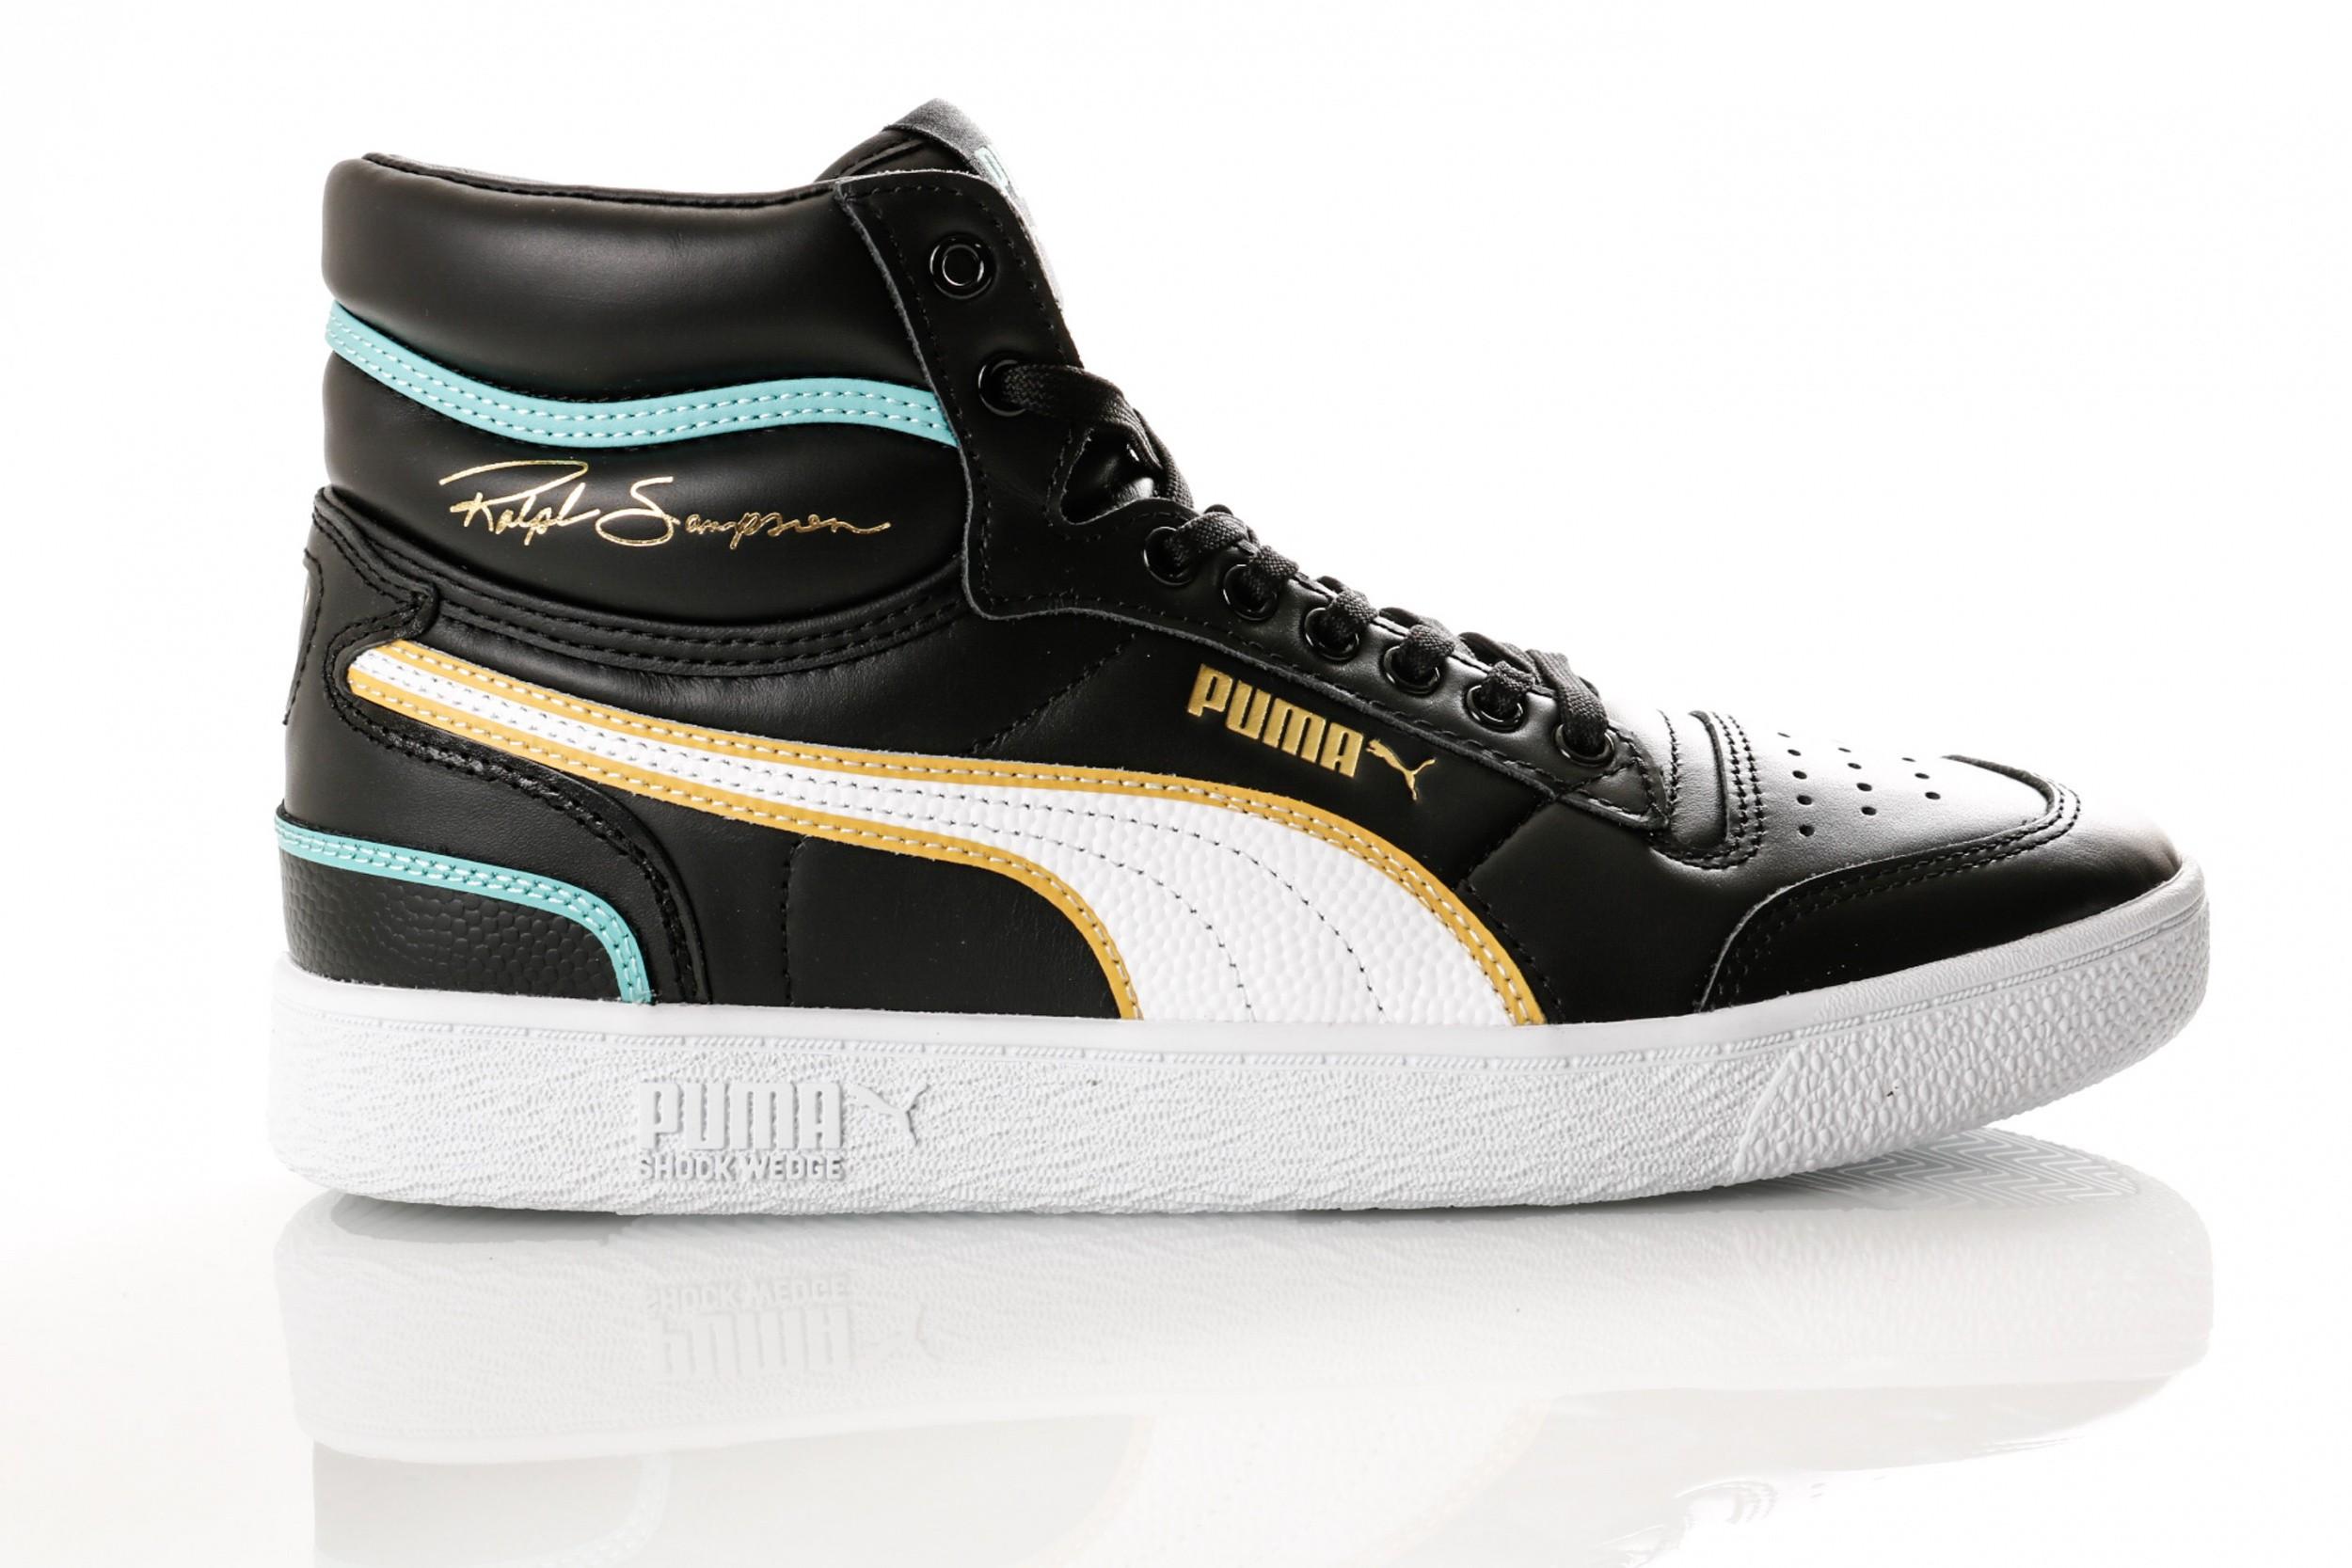 5c8e0528018 Puma Ralph Sampson Mid Hoops 370842 01 Sneakers Puma Black-Puma White-Puma  White